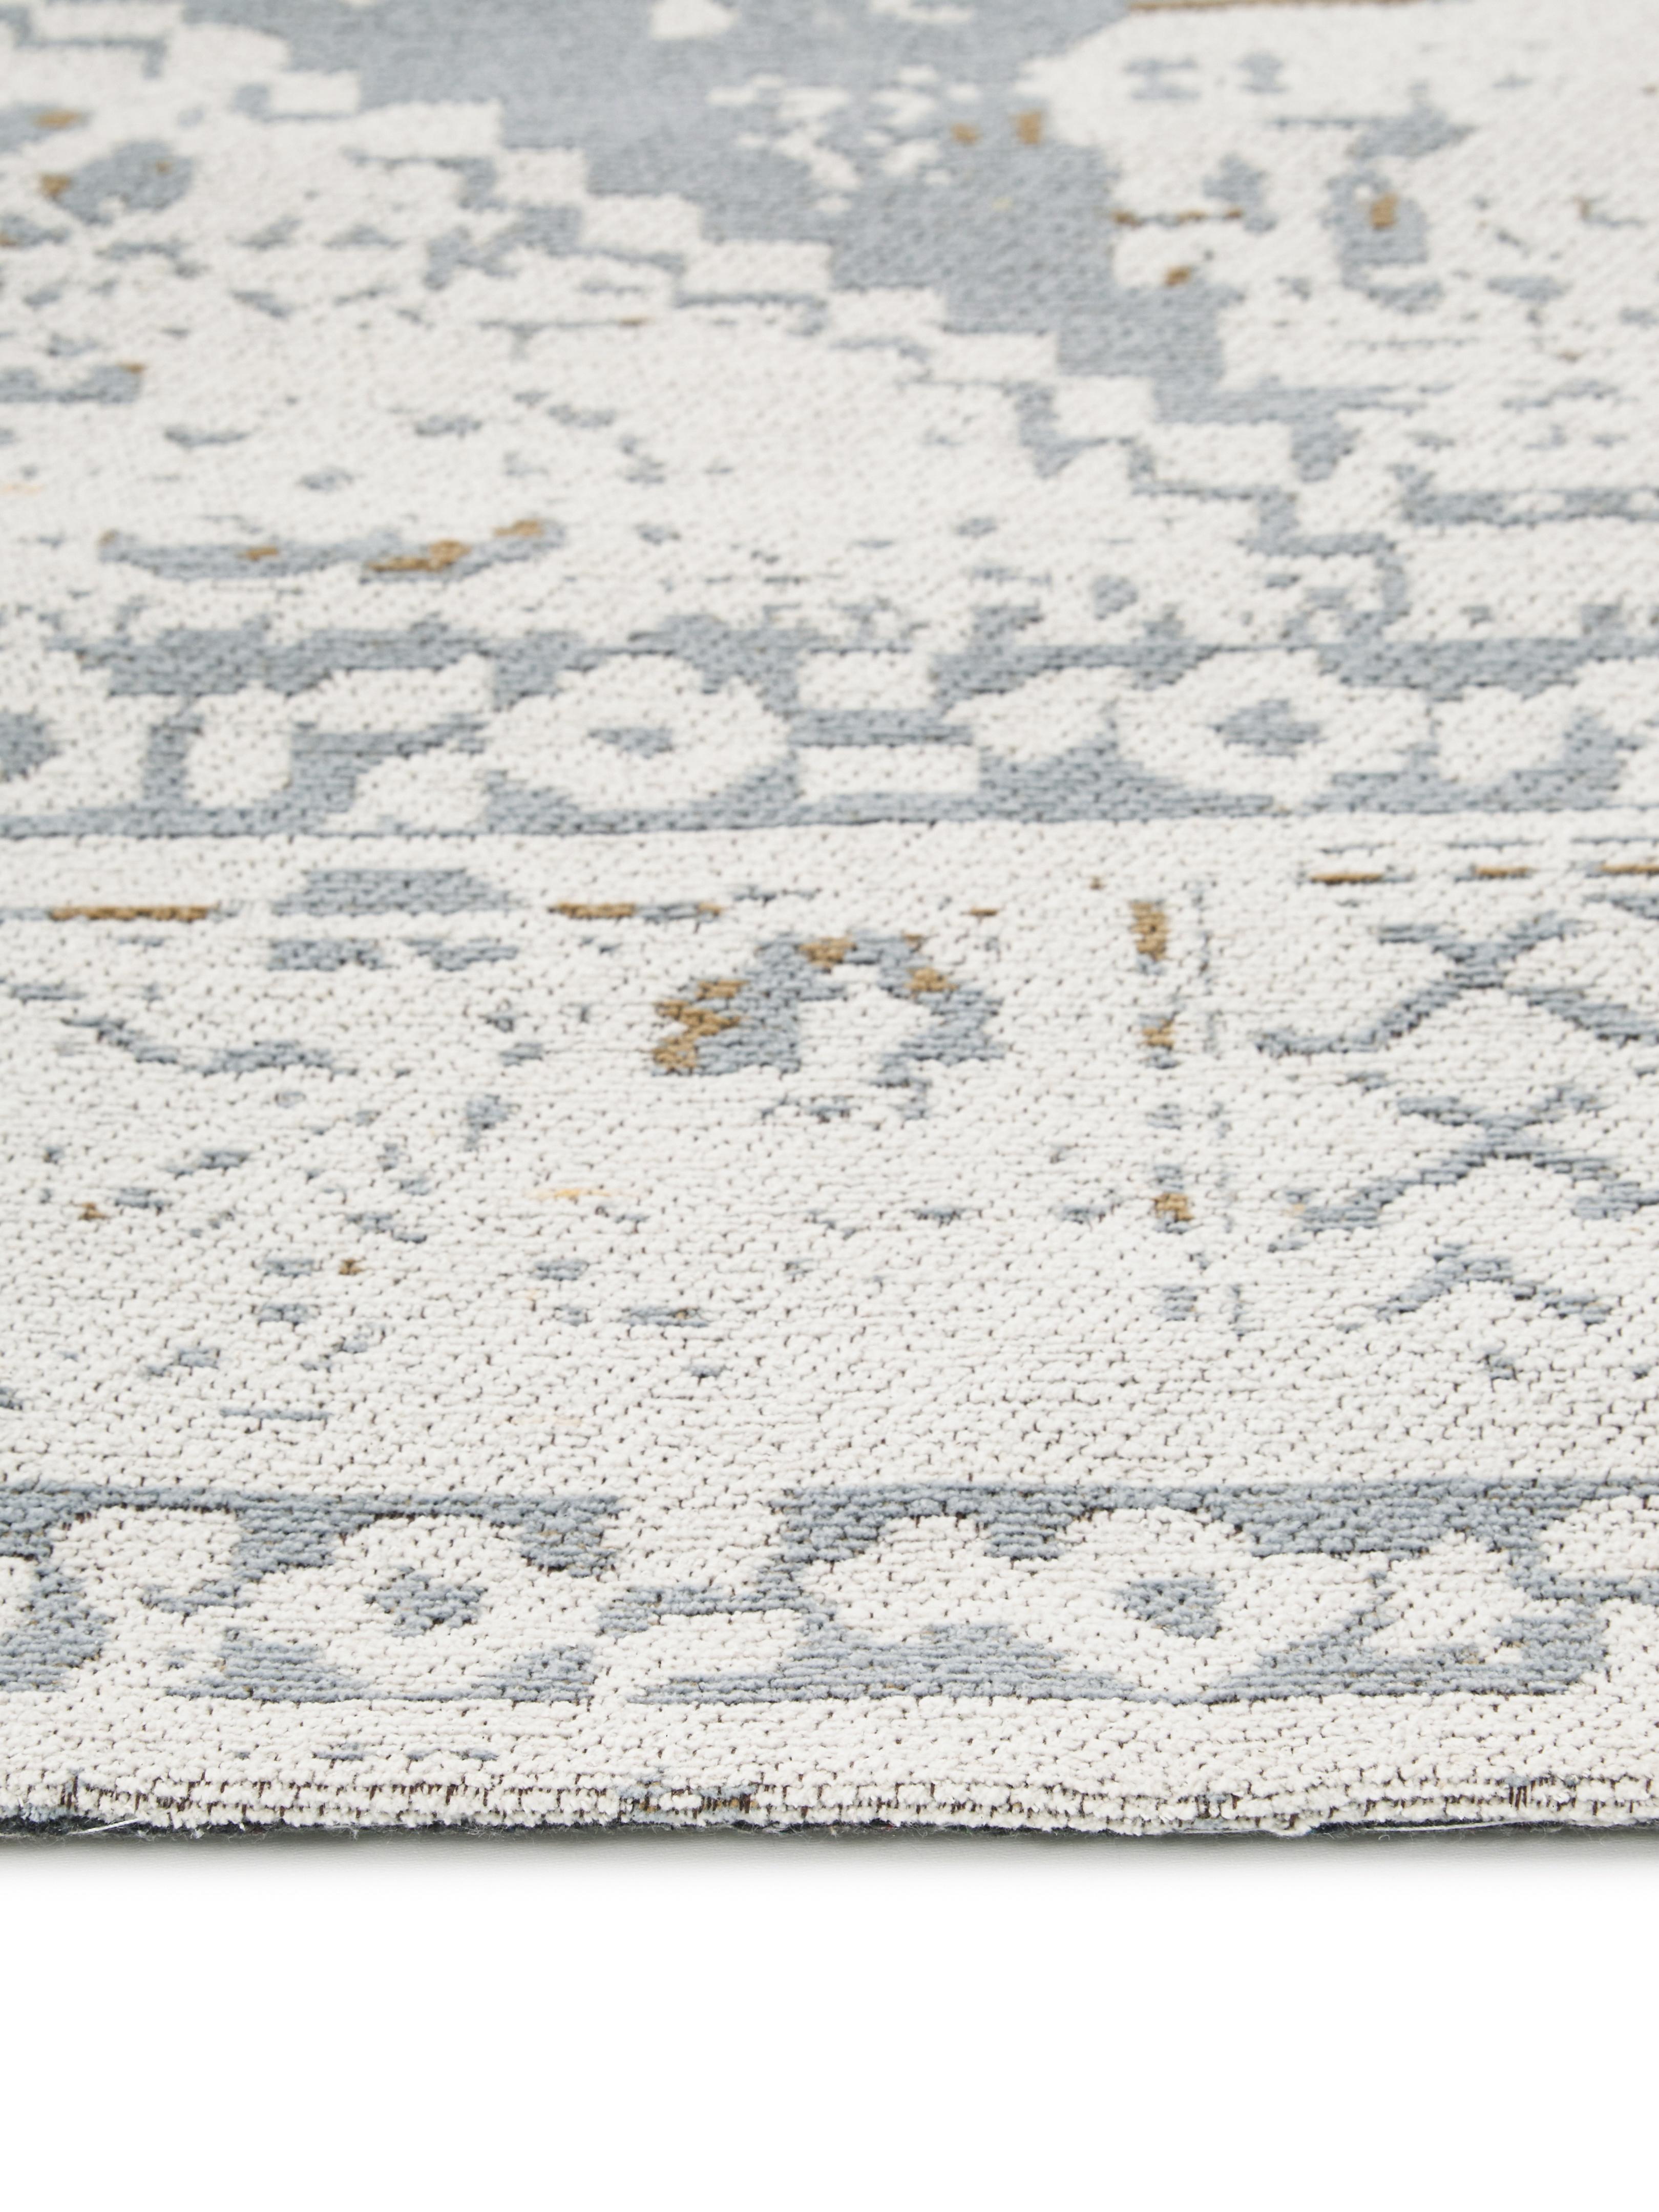 Handgewebter Chenilleteppich Neapel im Vintage Style, Flor: 95% Baumwolle, 5% Polyest, Hellgrau, Creme, Taupe, B 200 x L 300 cm (Grösse L)